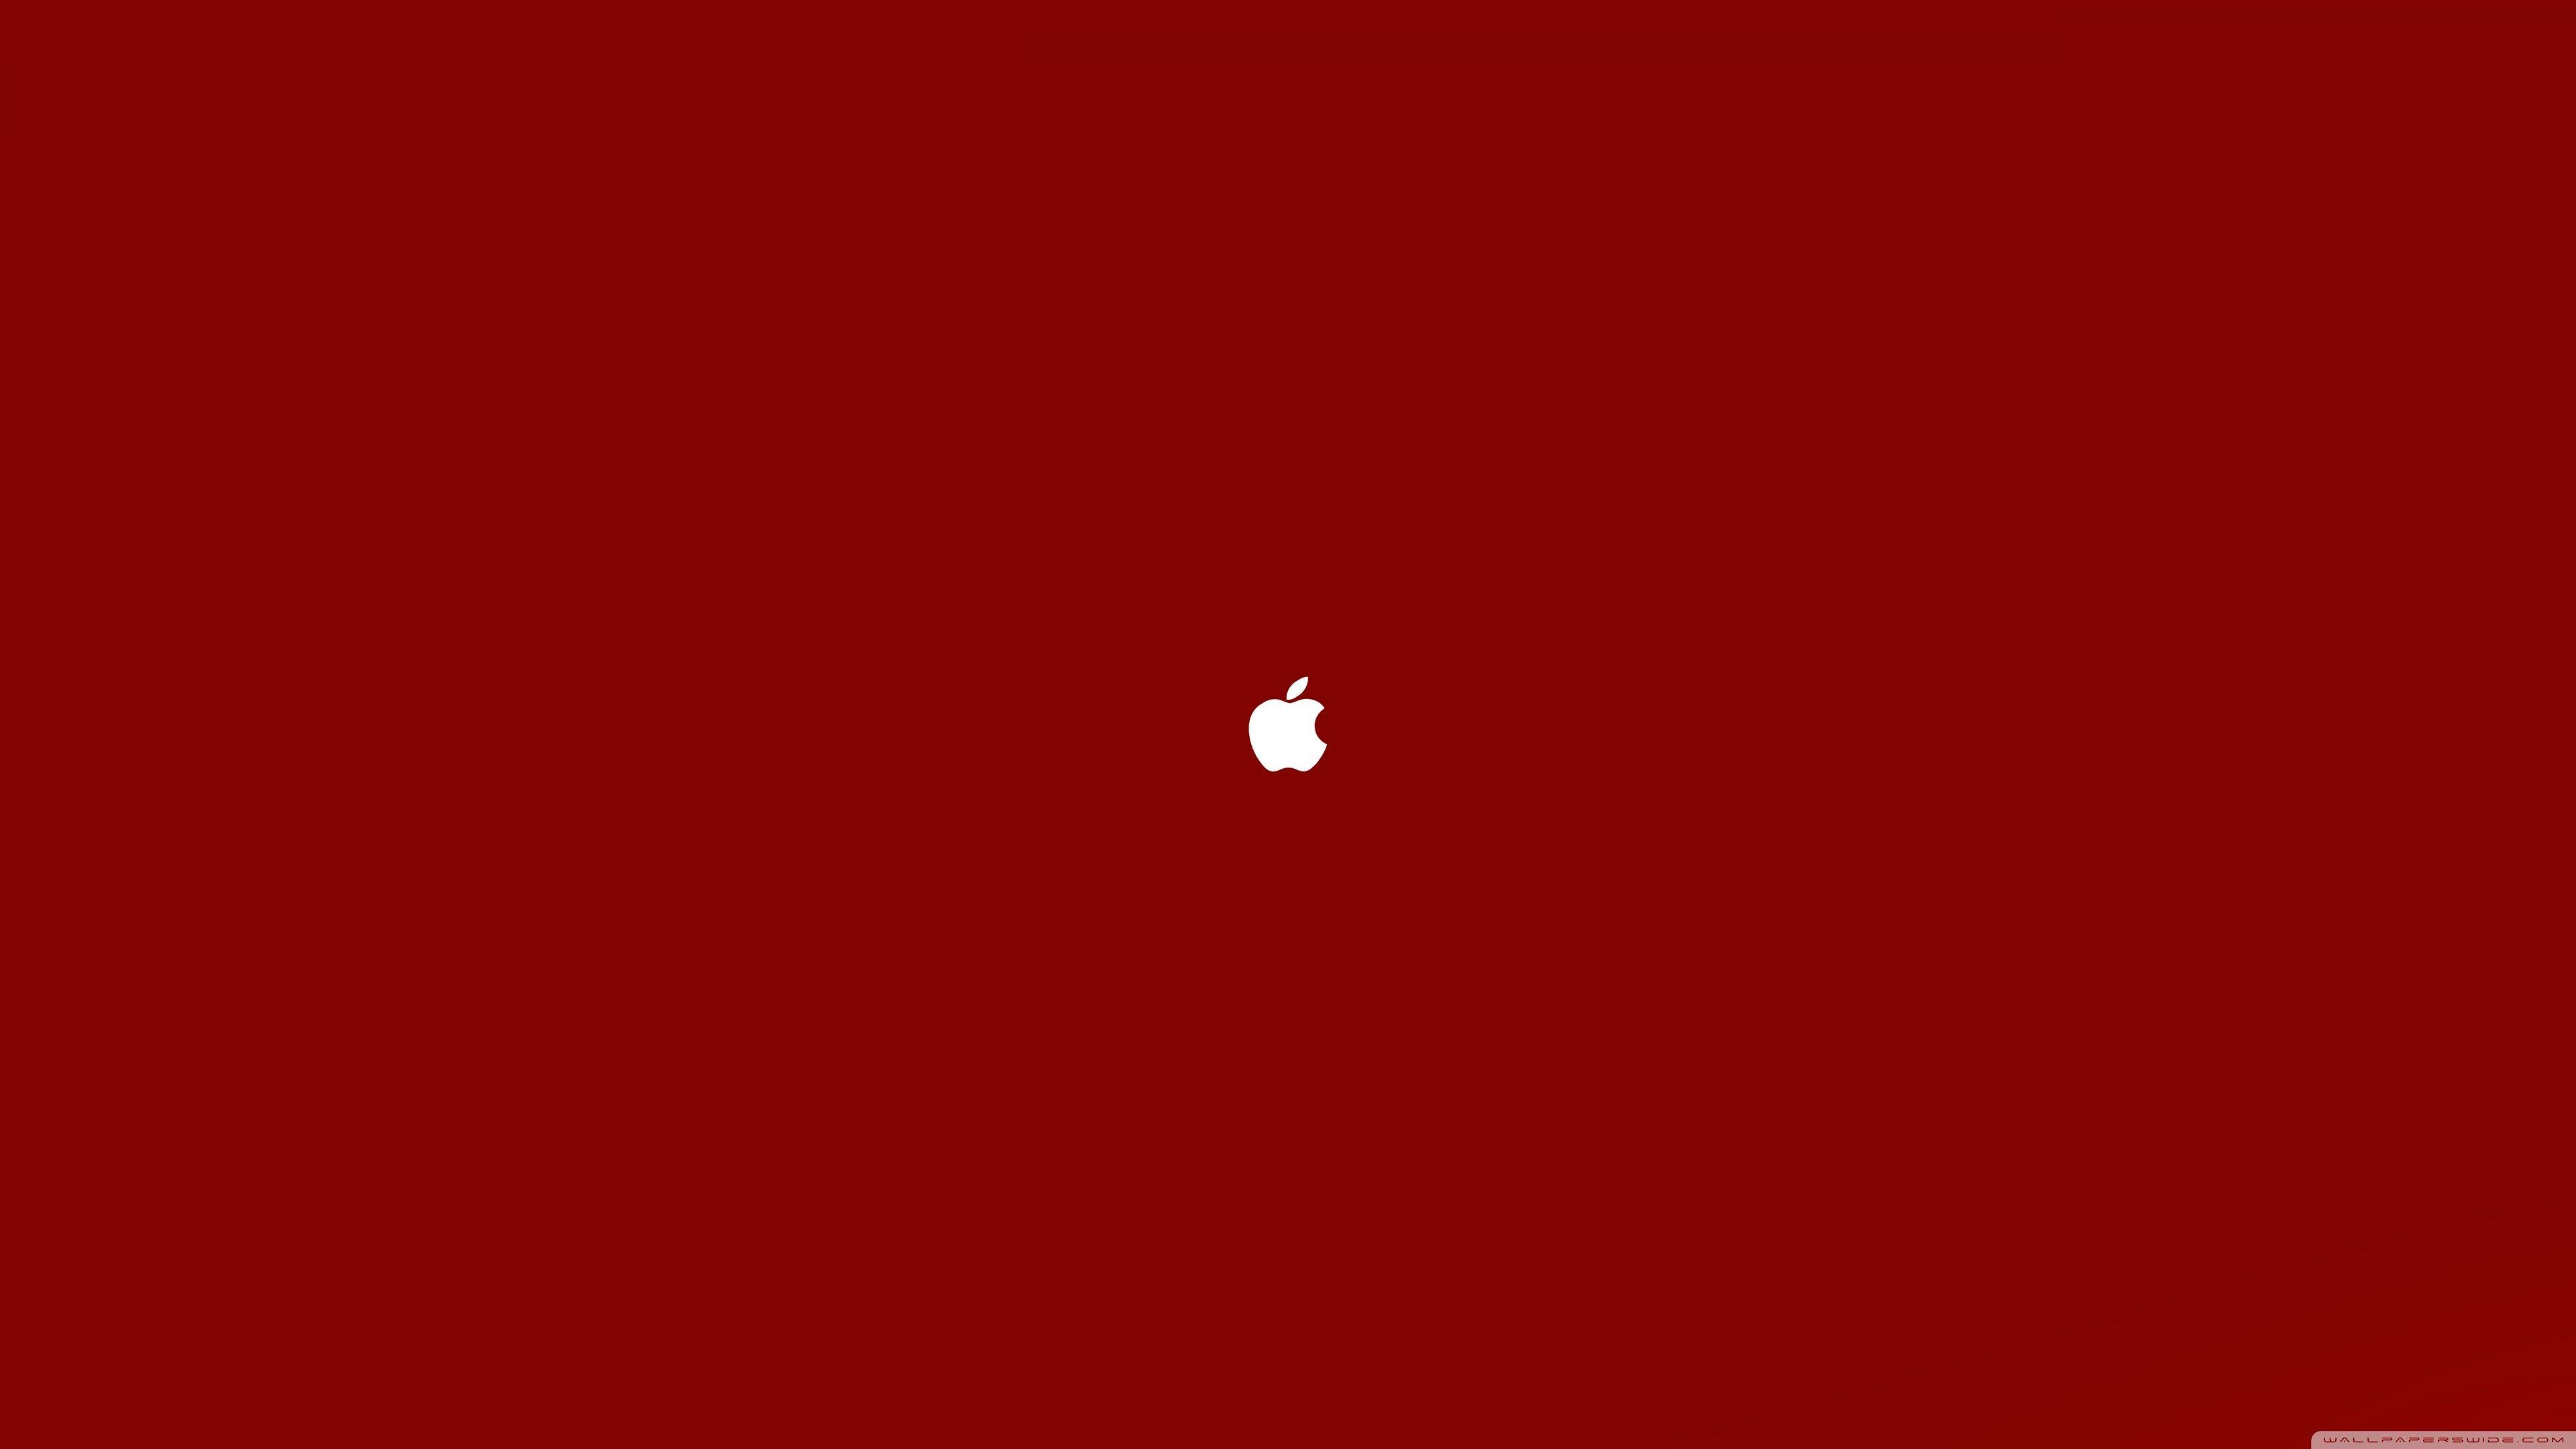 4K Red Gallery